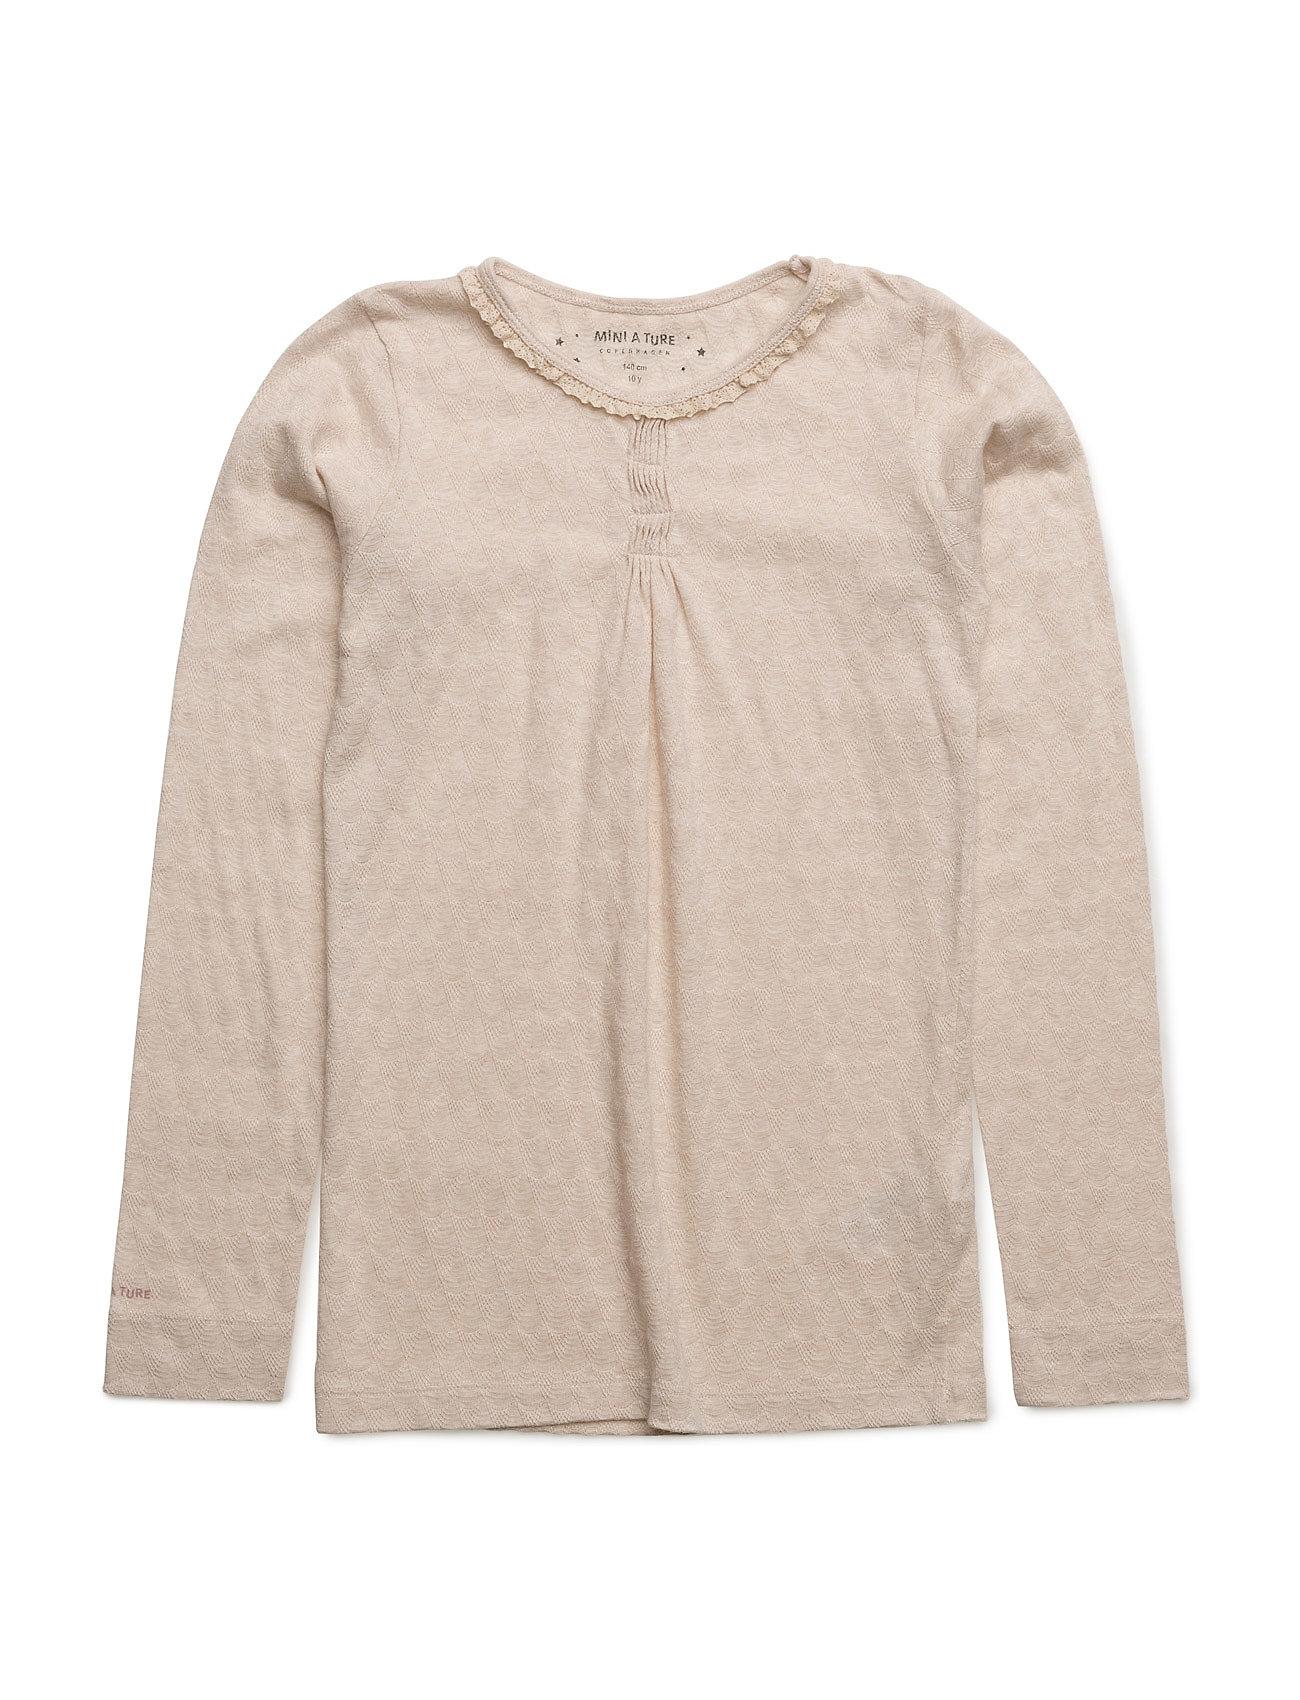 Mini A Ture Elianor, MK T-shirt